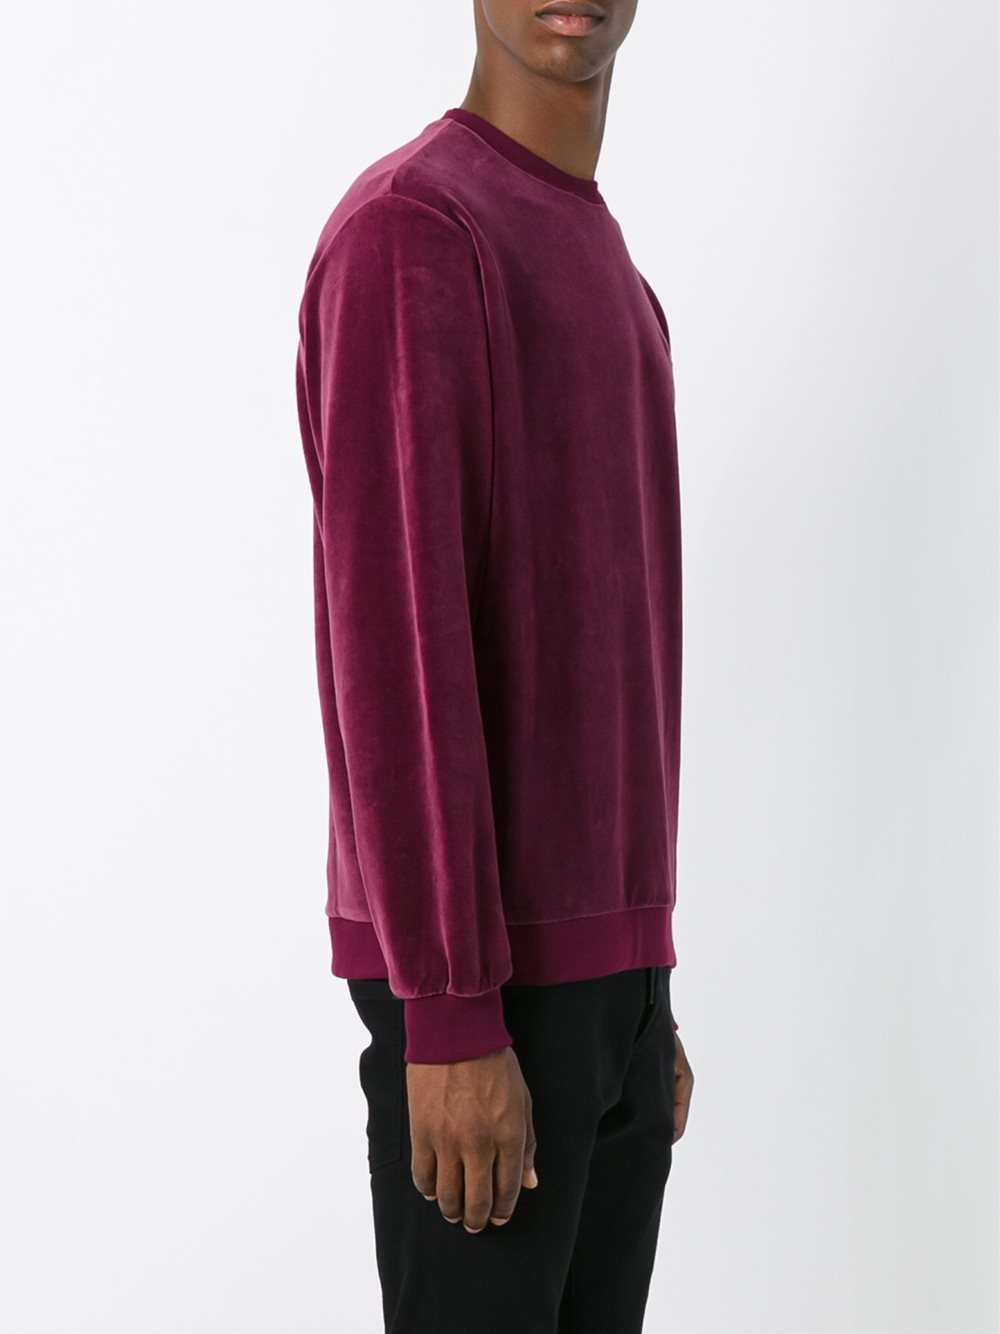 adidas originals velour crew sweatshirt for men lyst. Black Bedroom Furniture Sets. Home Design Ideas